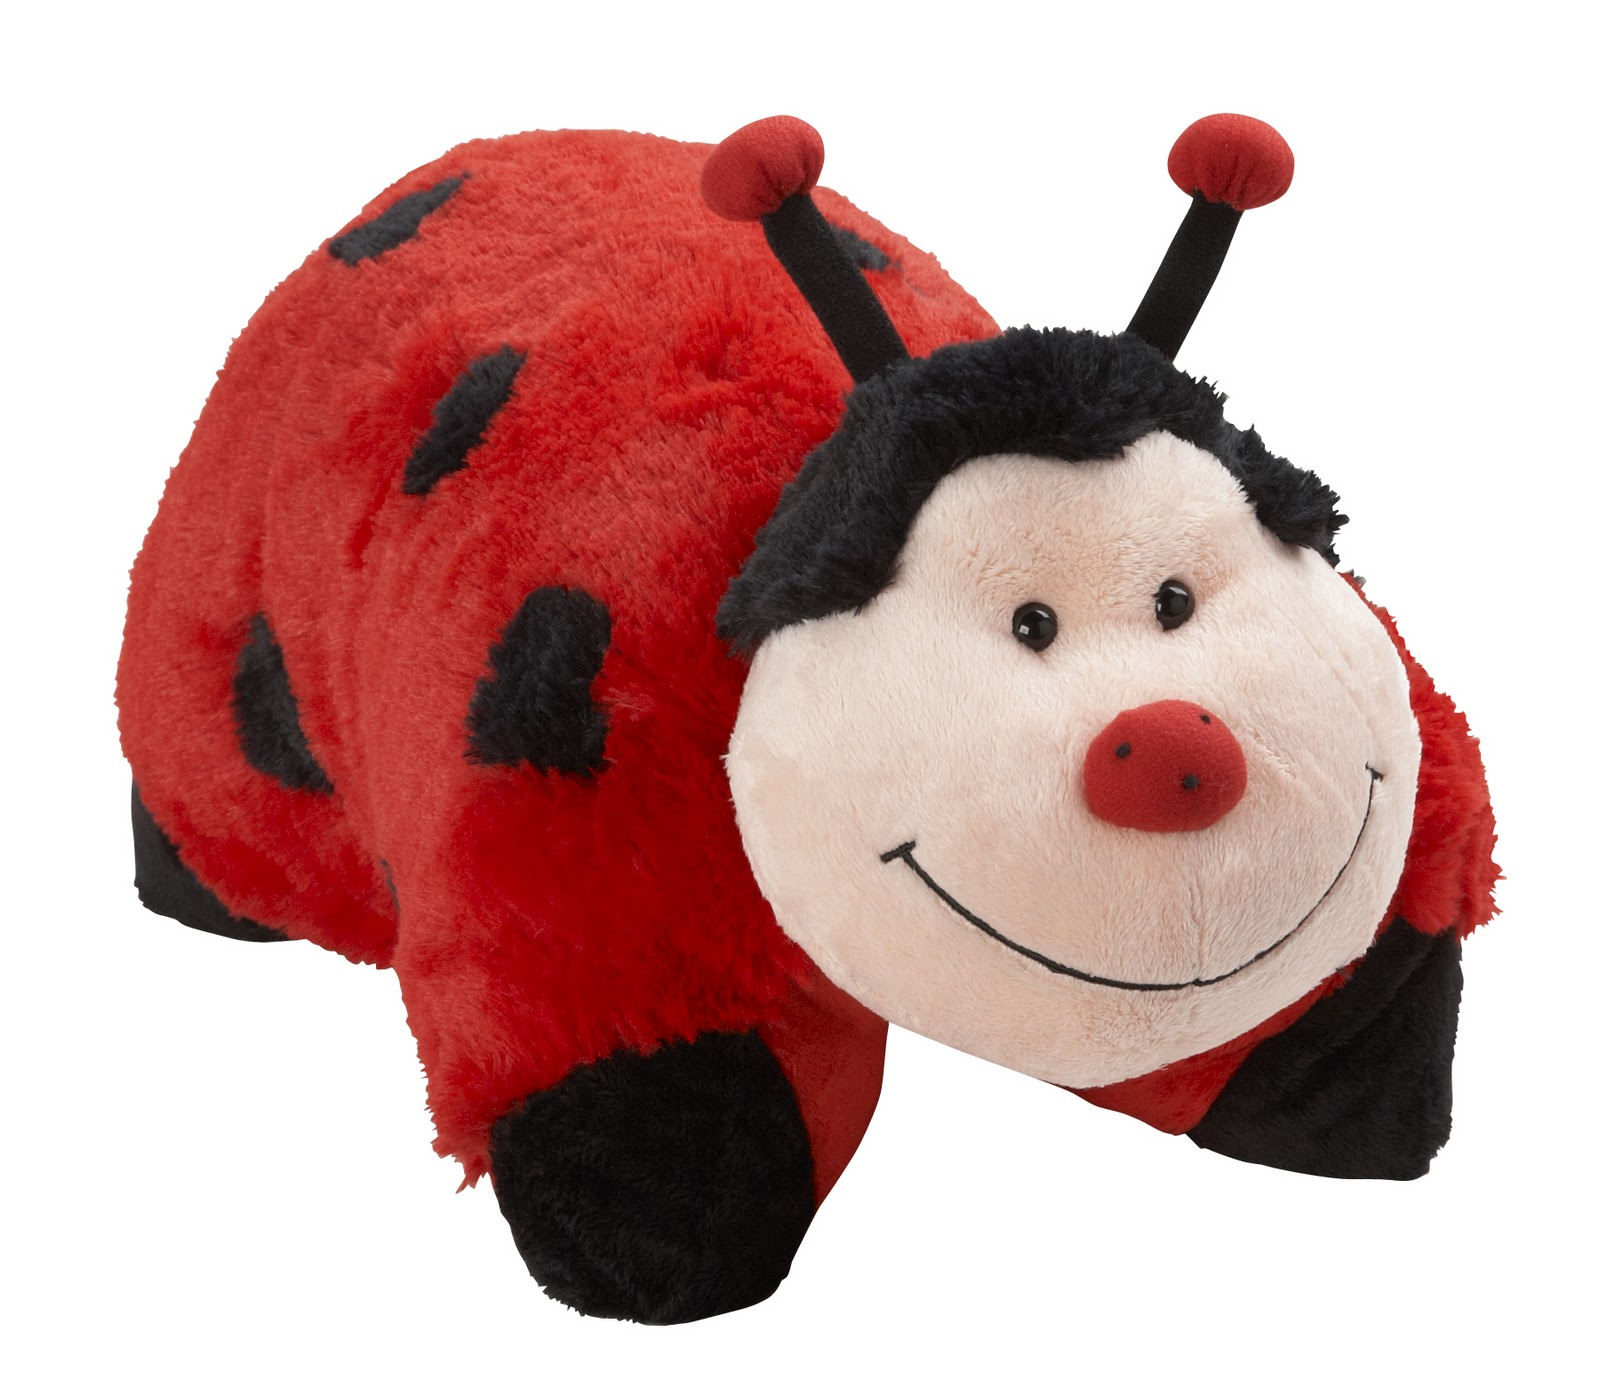 Closed Tis The Season To Giveaway Ladybug Pillowpet